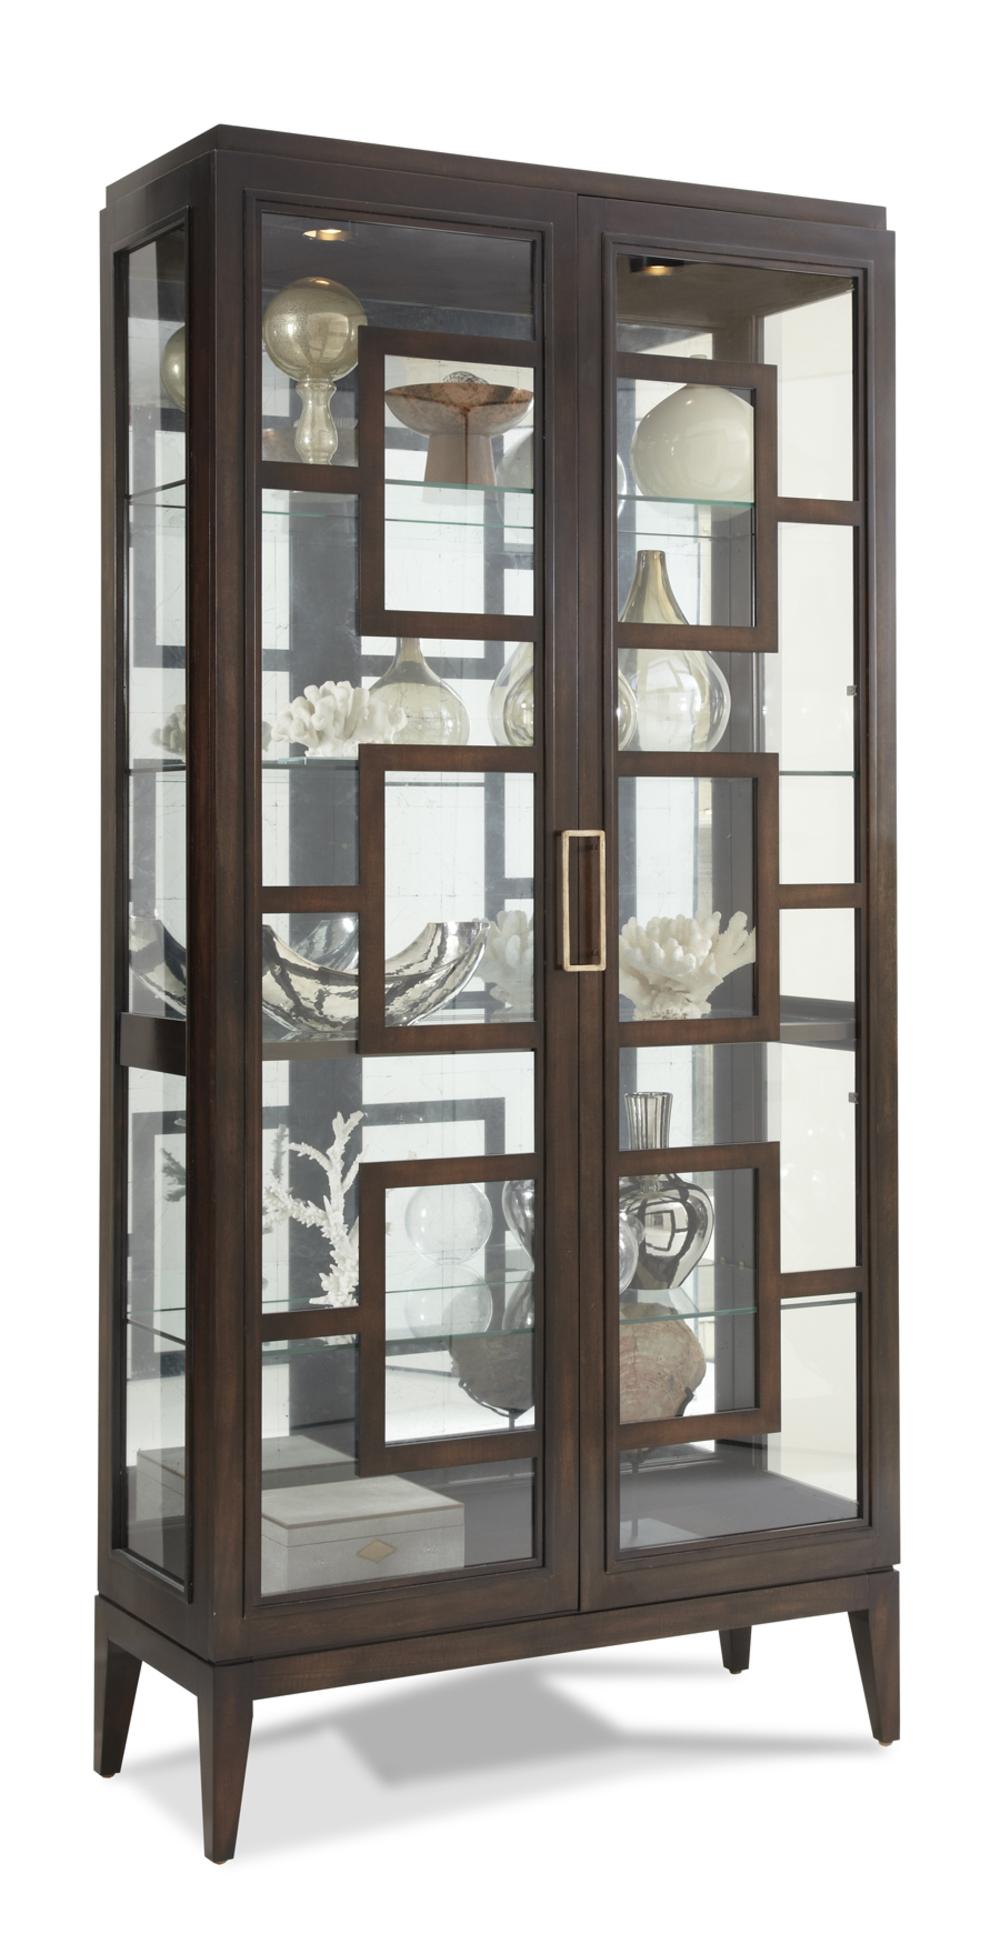 Hickory White - Rhodes Curio Cabinet